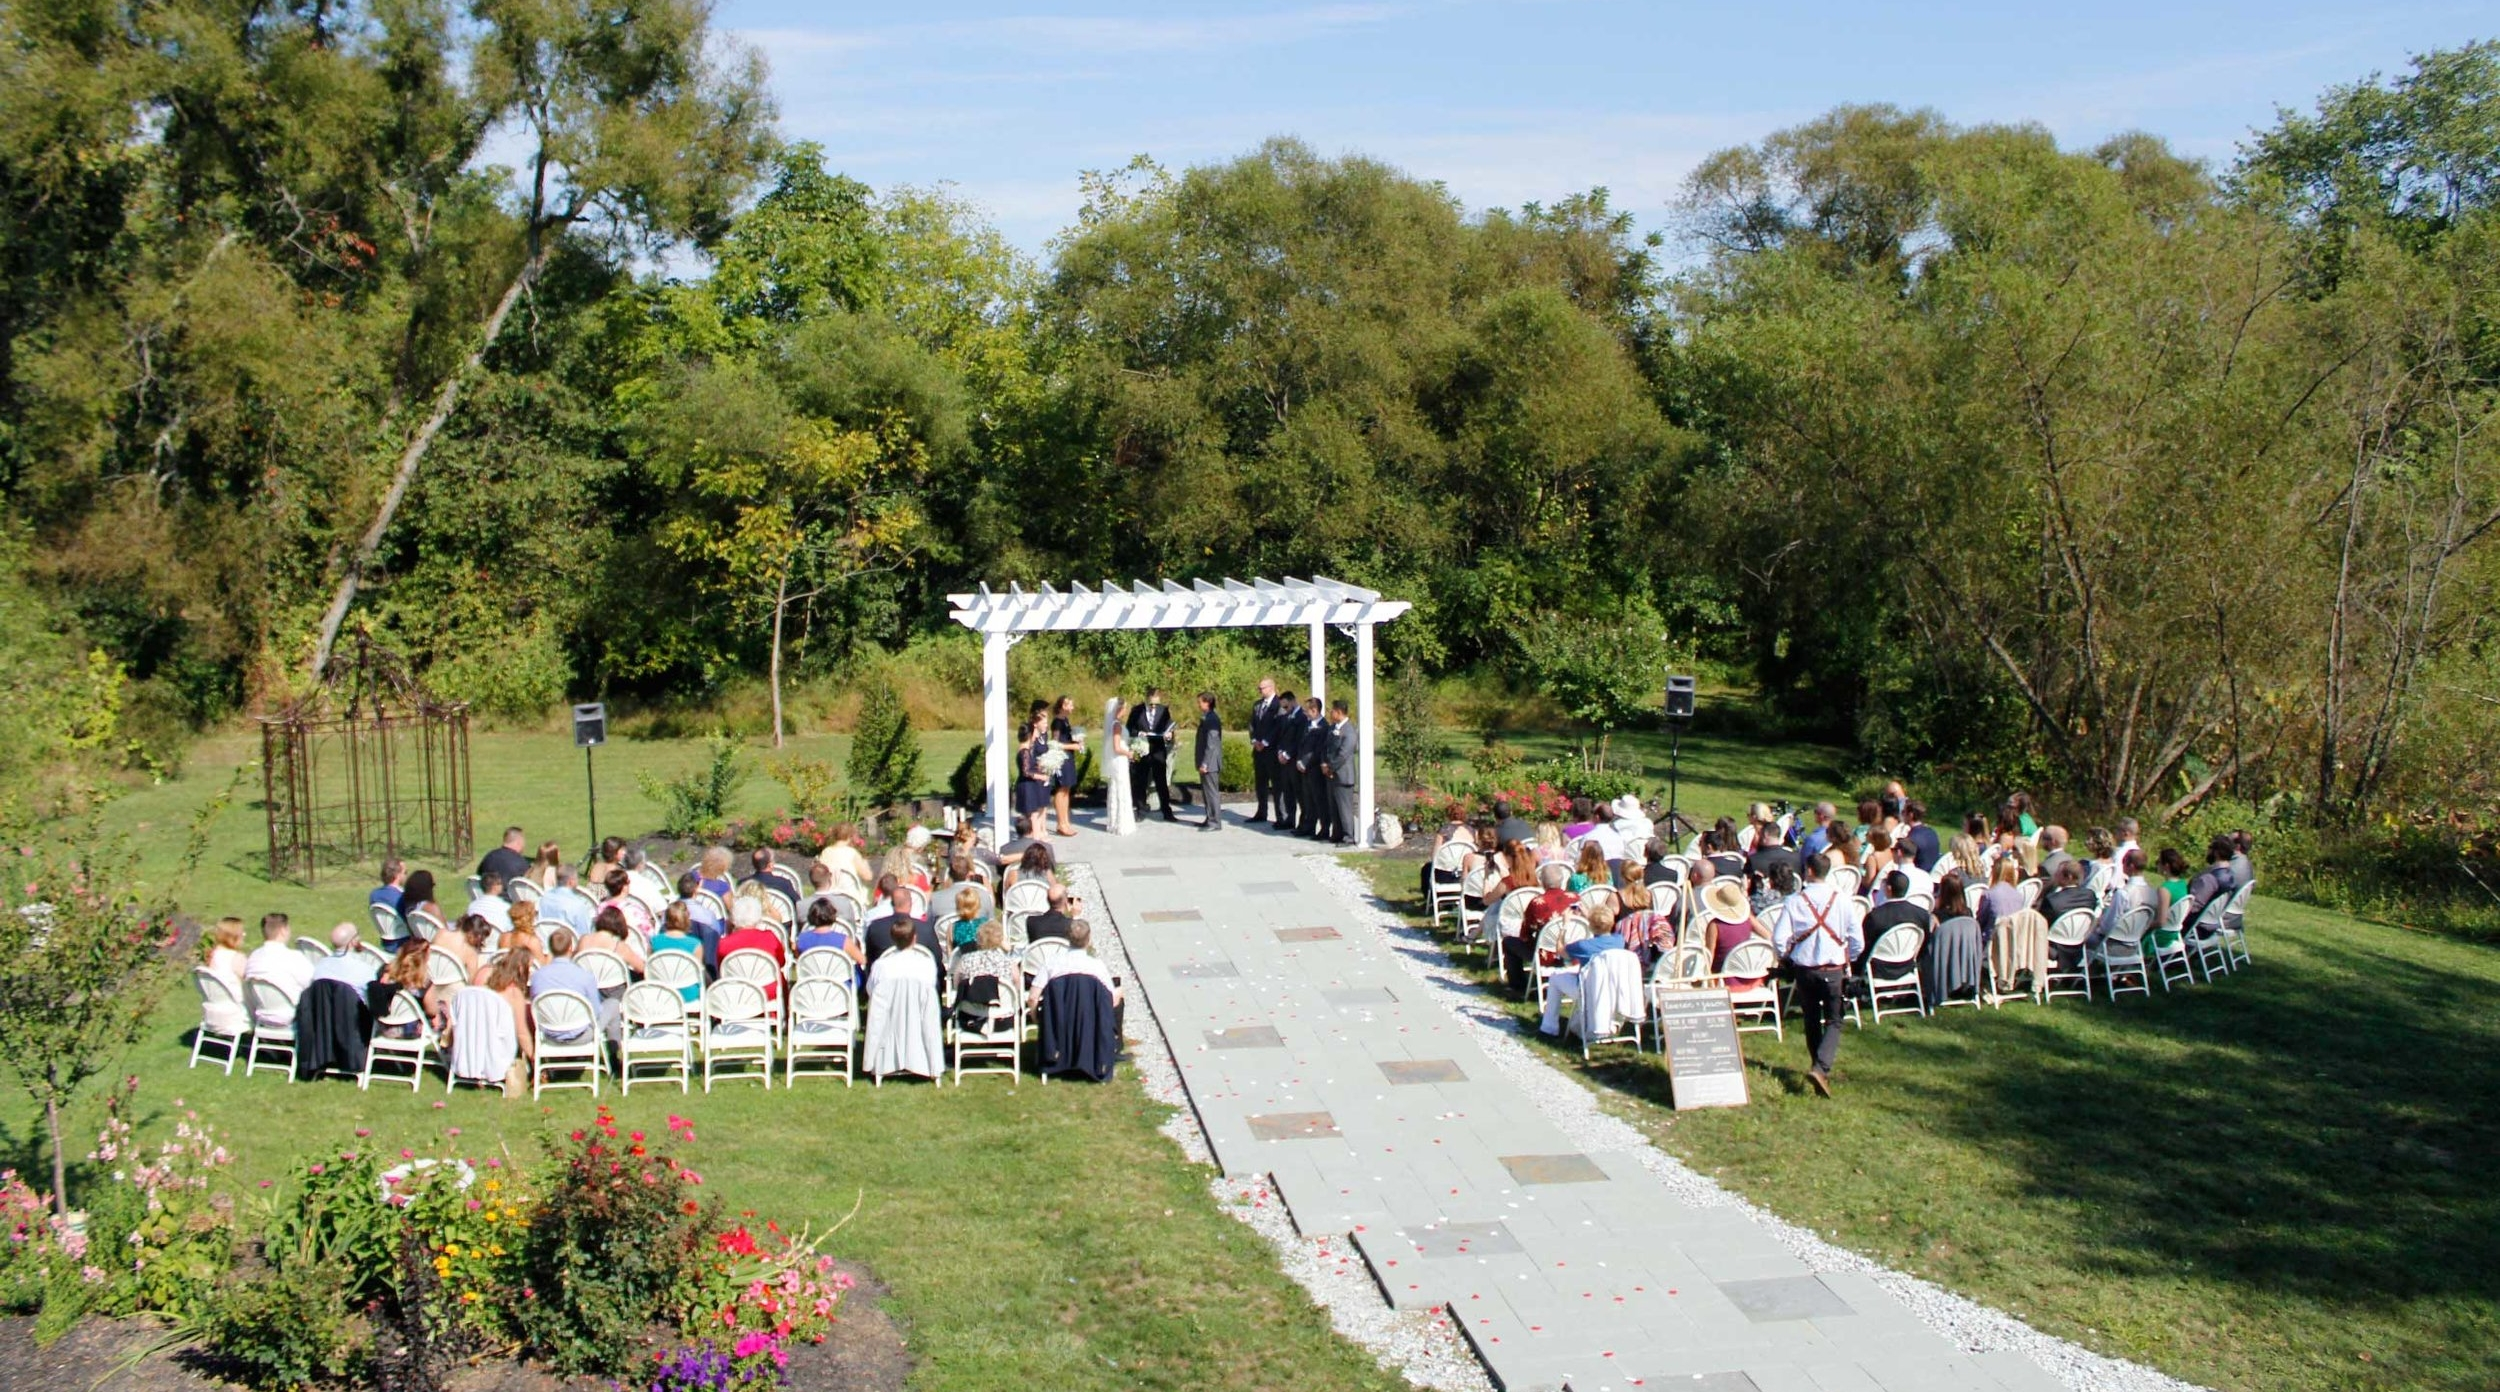 The Wedding Garden and Pergola outdoor wedding venue at Battlefield Bed and Breakfast Inn, Gettysburg, PA